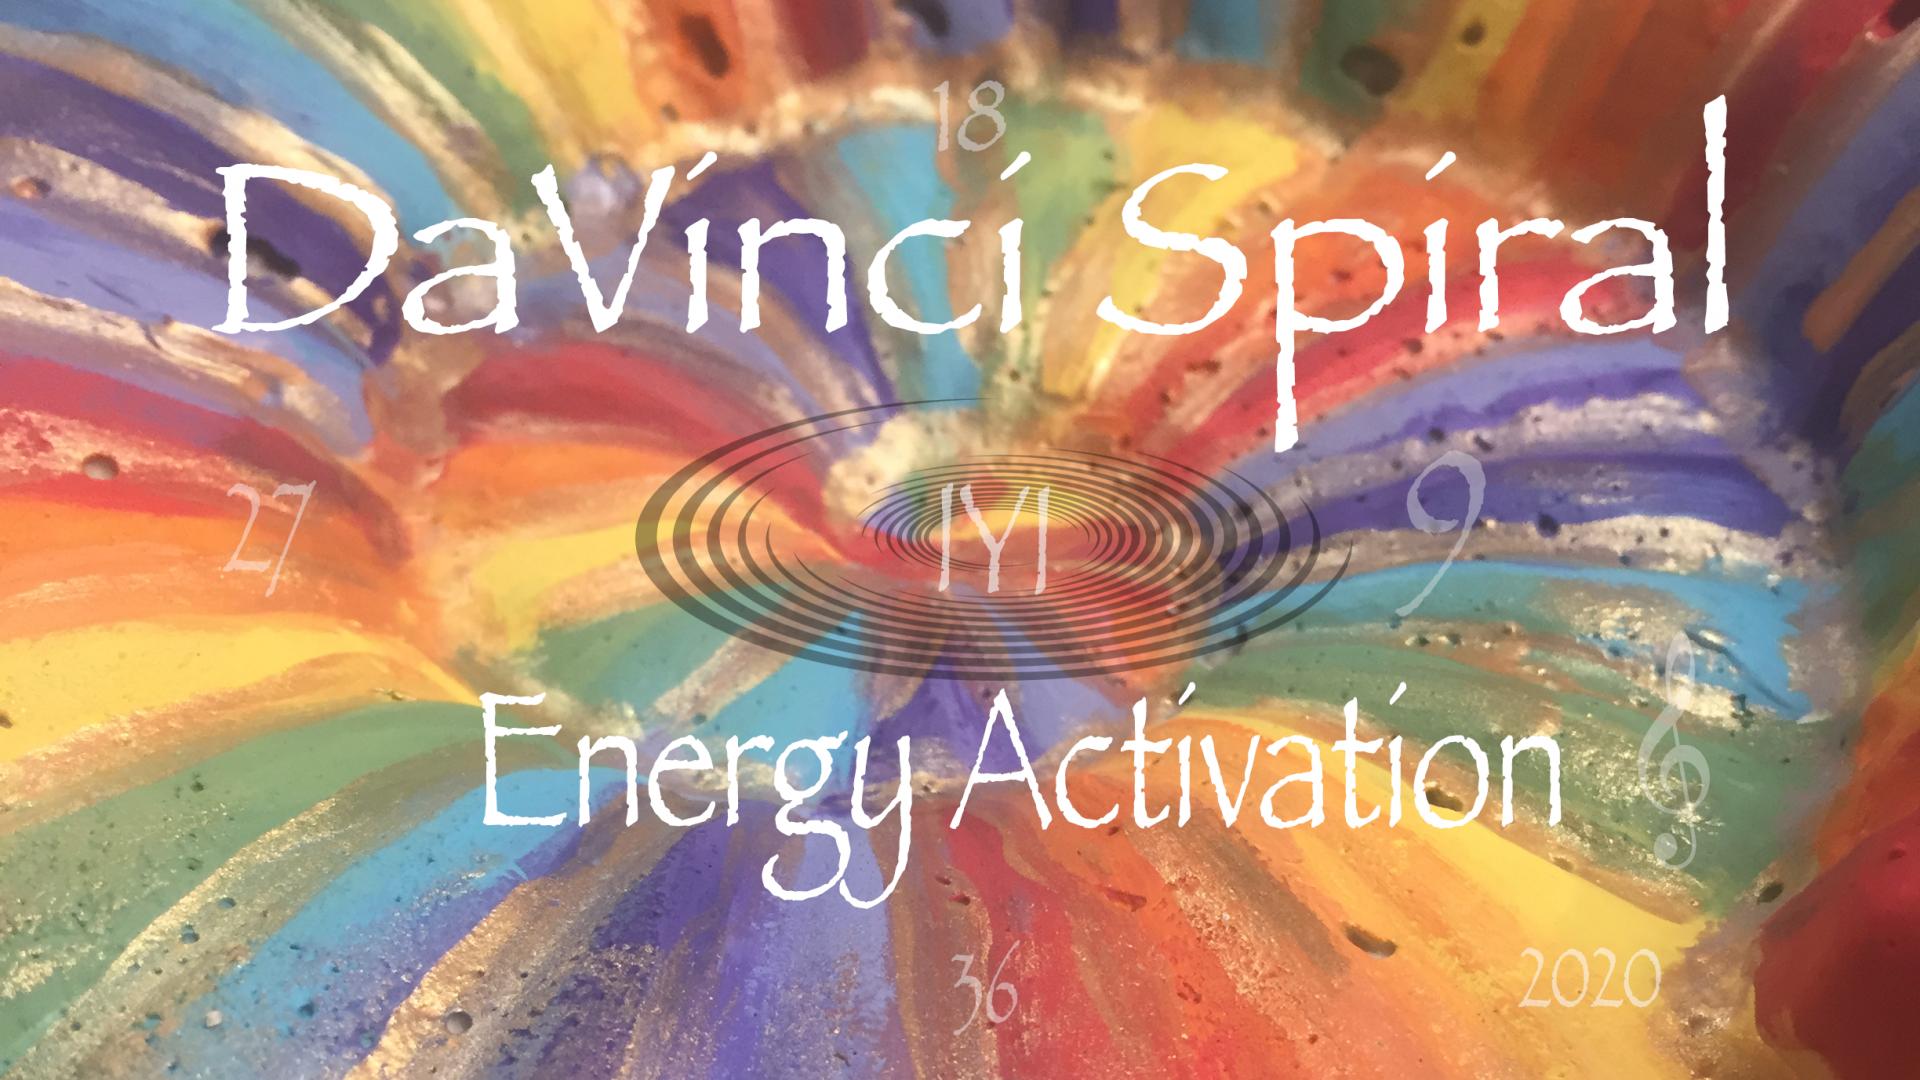 DaVinci Spiral Activation - Tzveta Davinci - Transformational Coaching